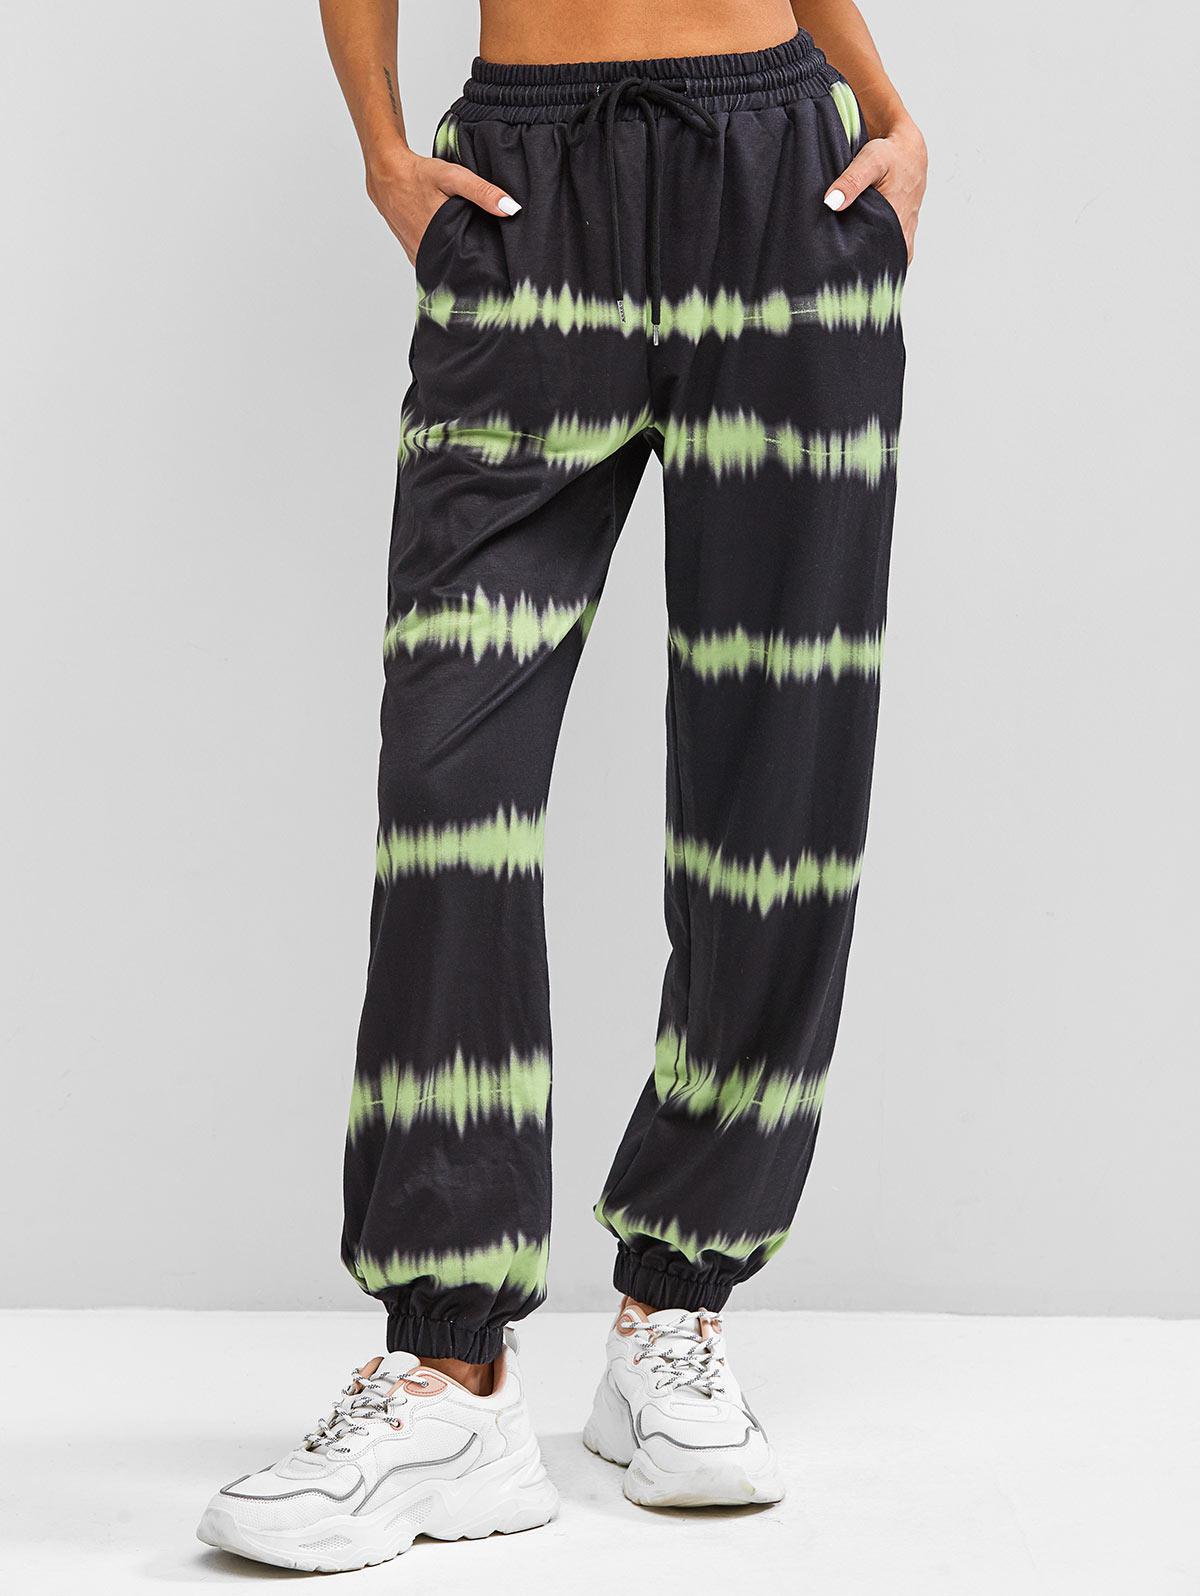 ZAFUL High Waisted Tie Dye Jogger Pants